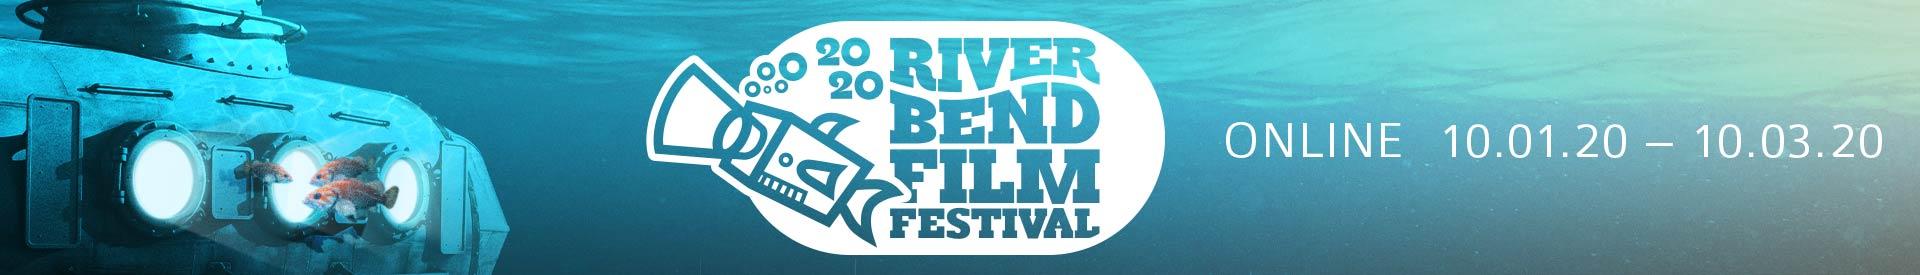 River Bend Film Festival 2020